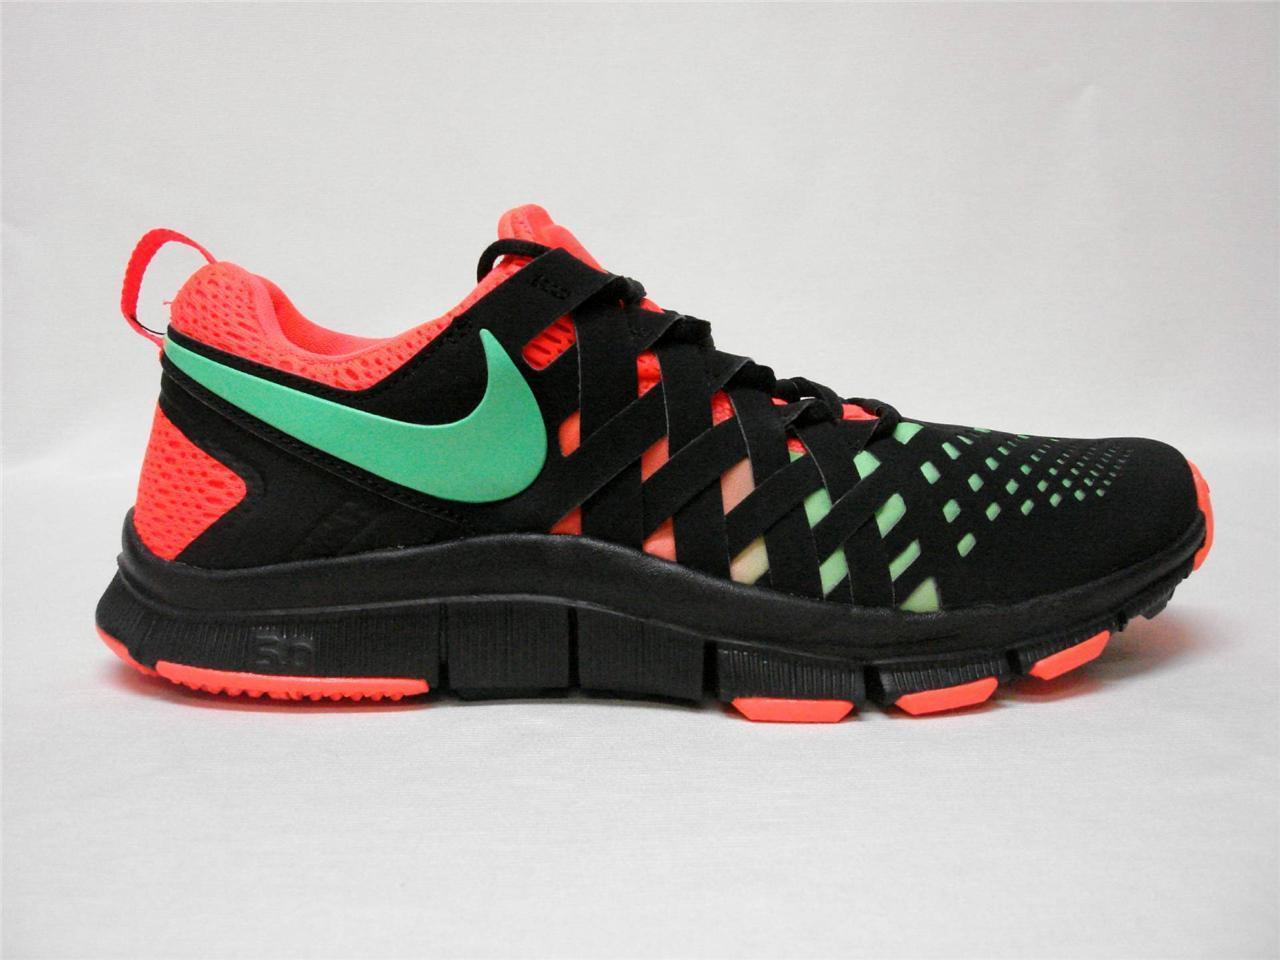 Neuf Dans Box Nike Libre Trainer 5.0 NRG chaussures hommes  10  Noir  Sweet looking